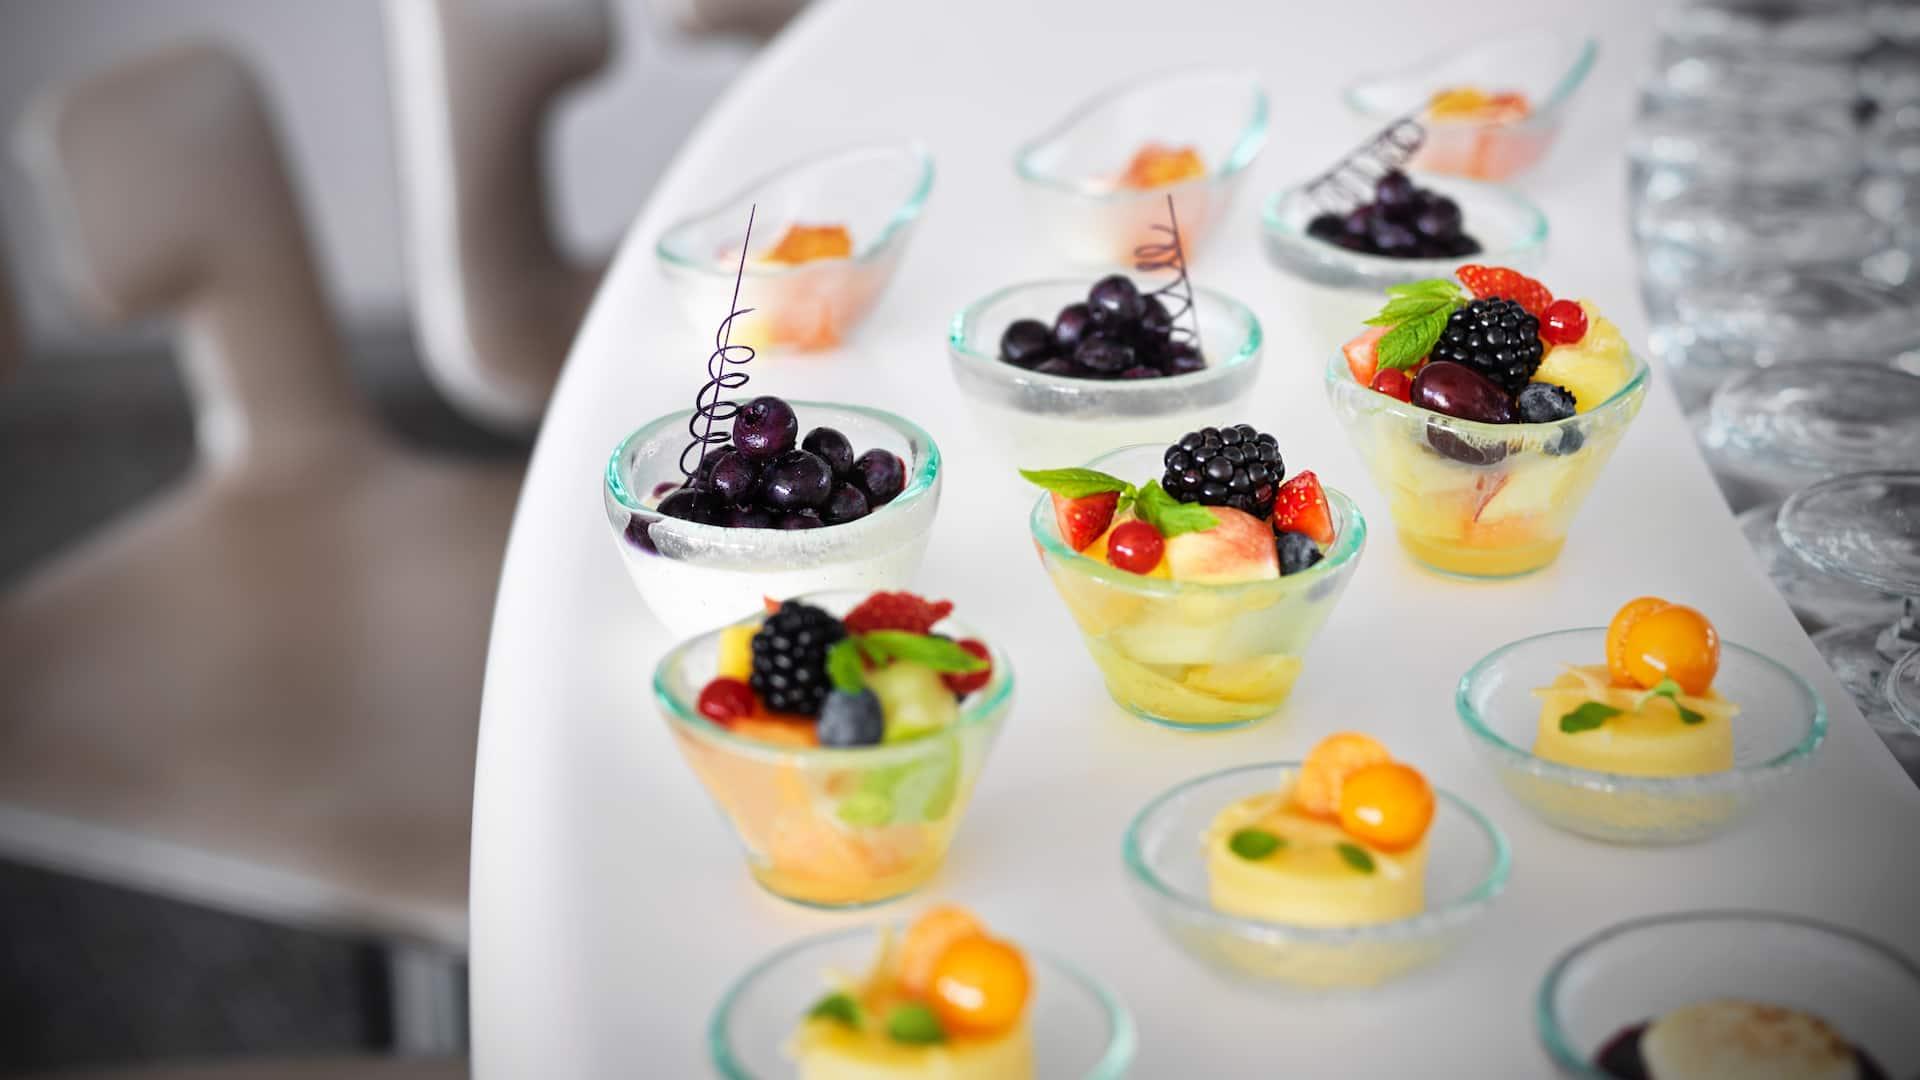 Creative and balanced food concepts at Hyatt Regency Dusseldorf